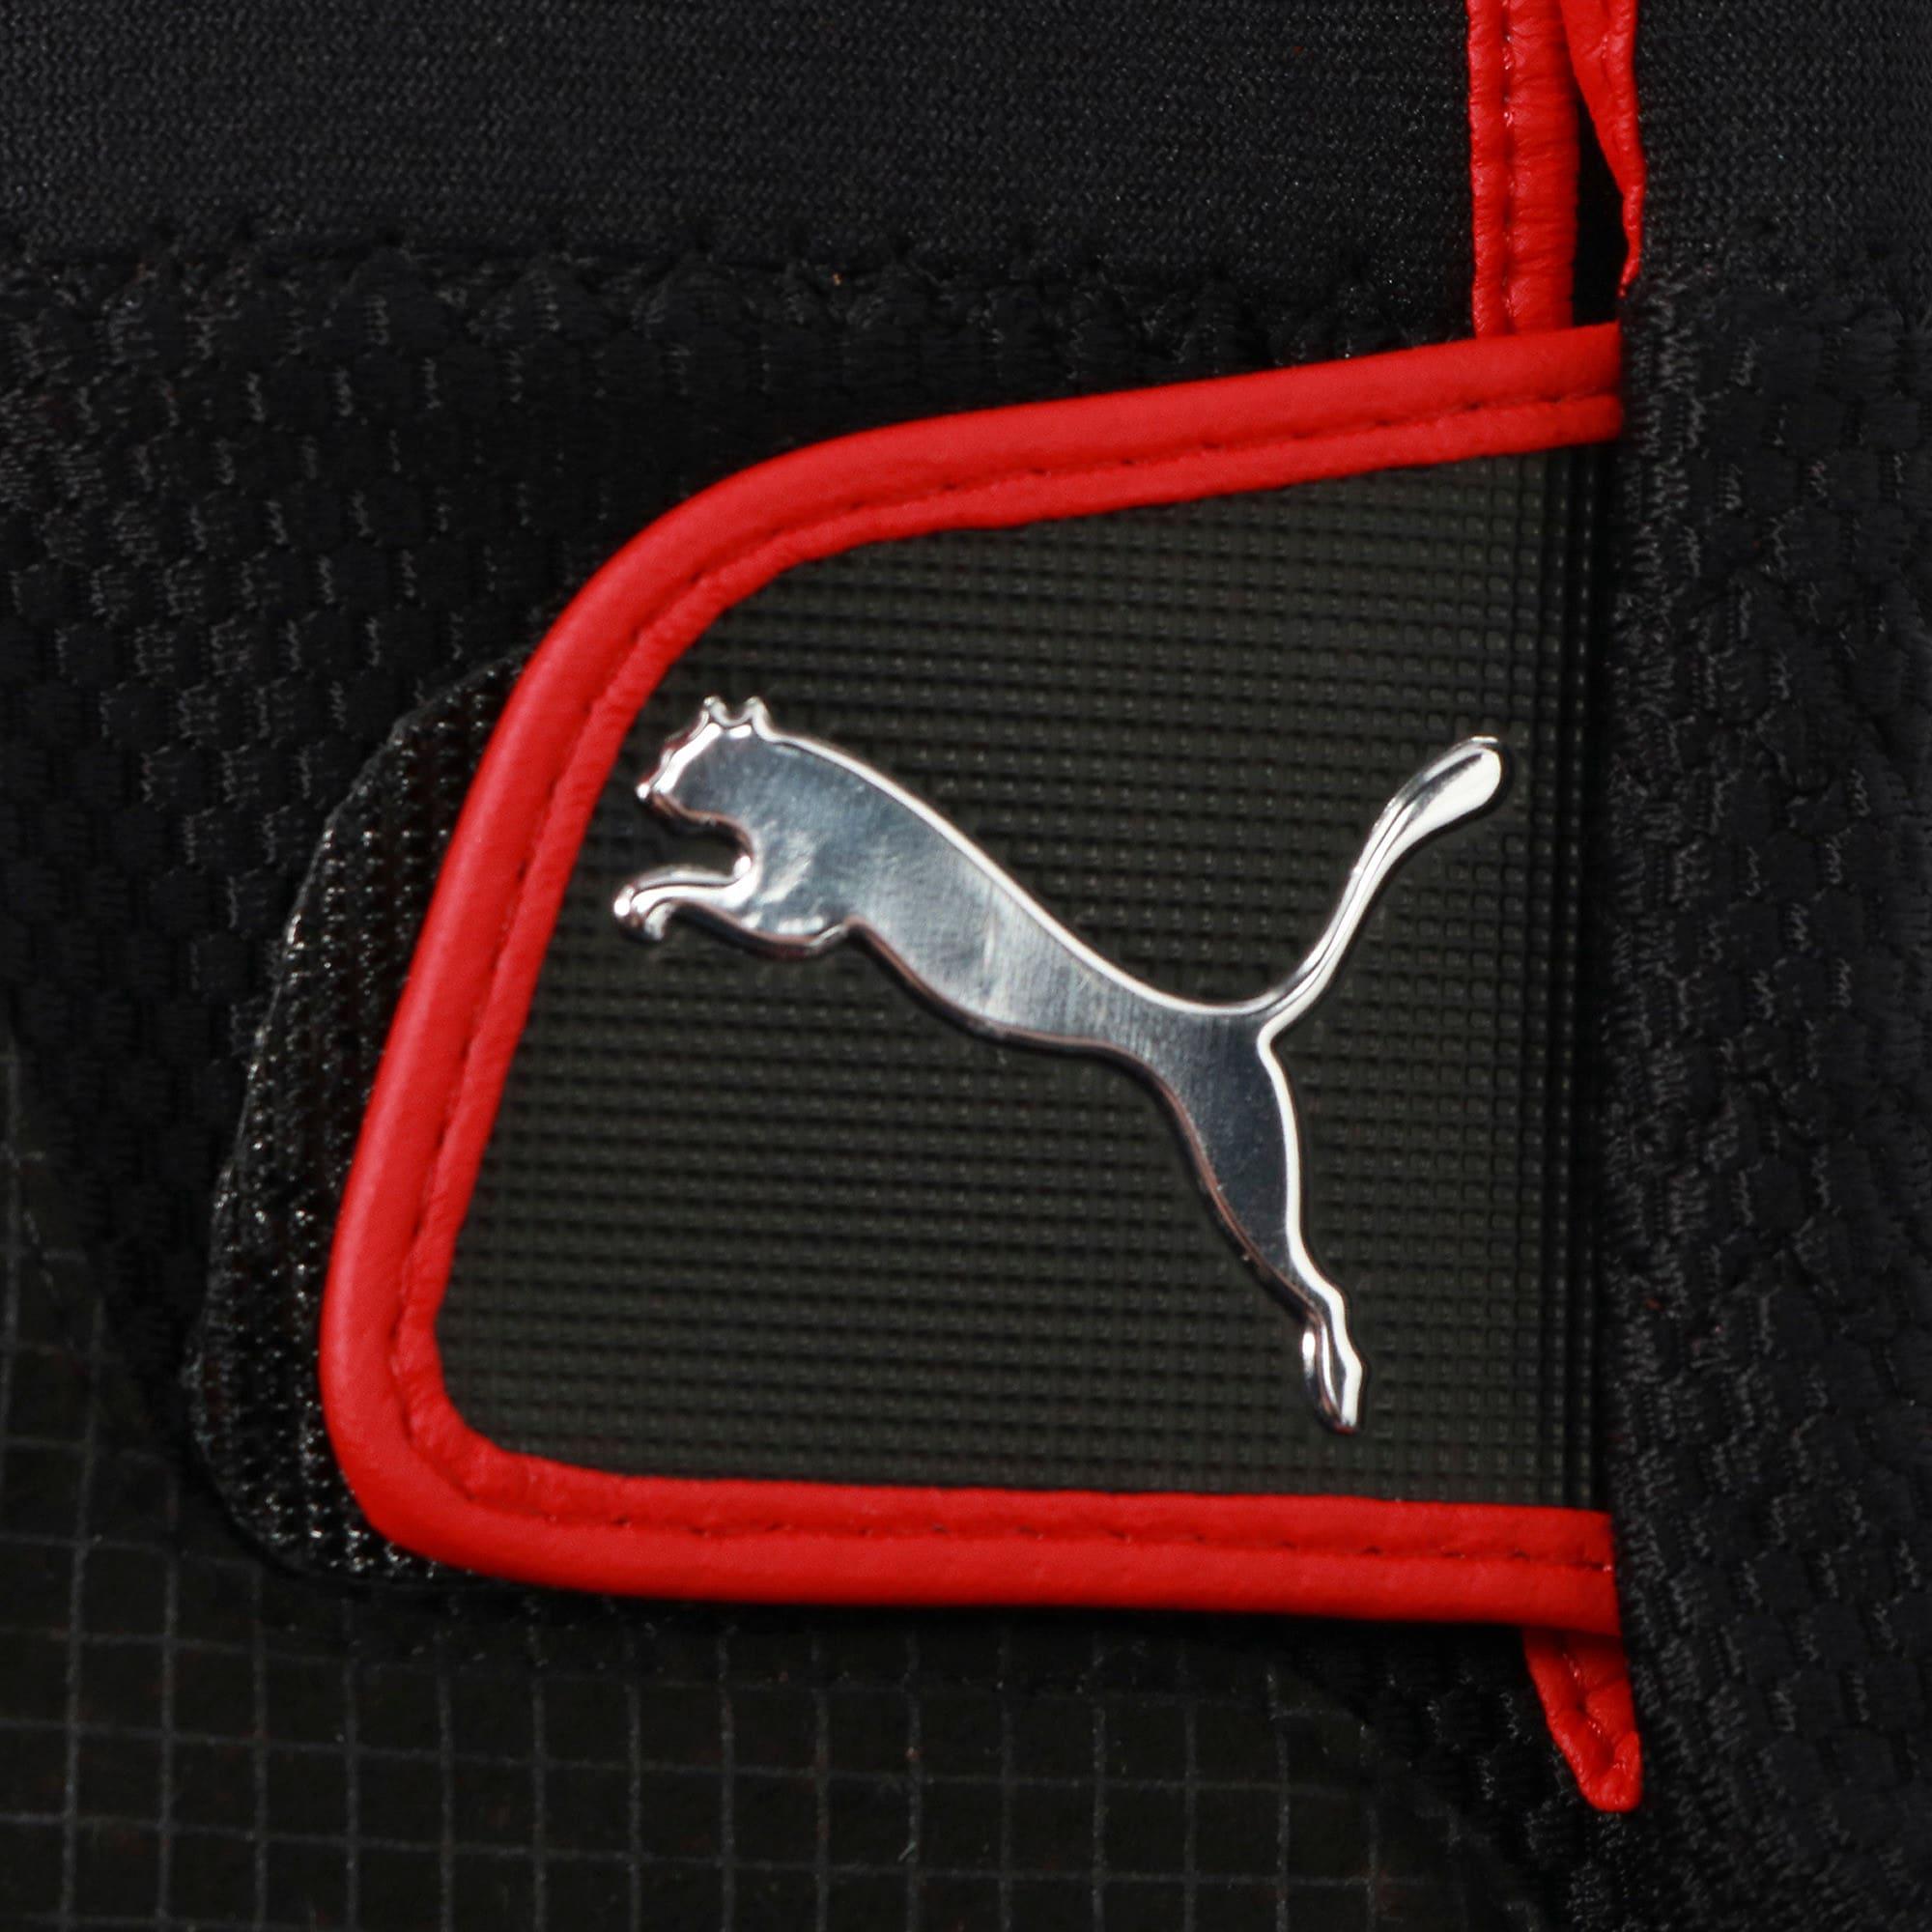 Thumbnail 3 of ゴルフ 3D ウィンター グローブ, Puma Black / High Risk Red, medium-JPN